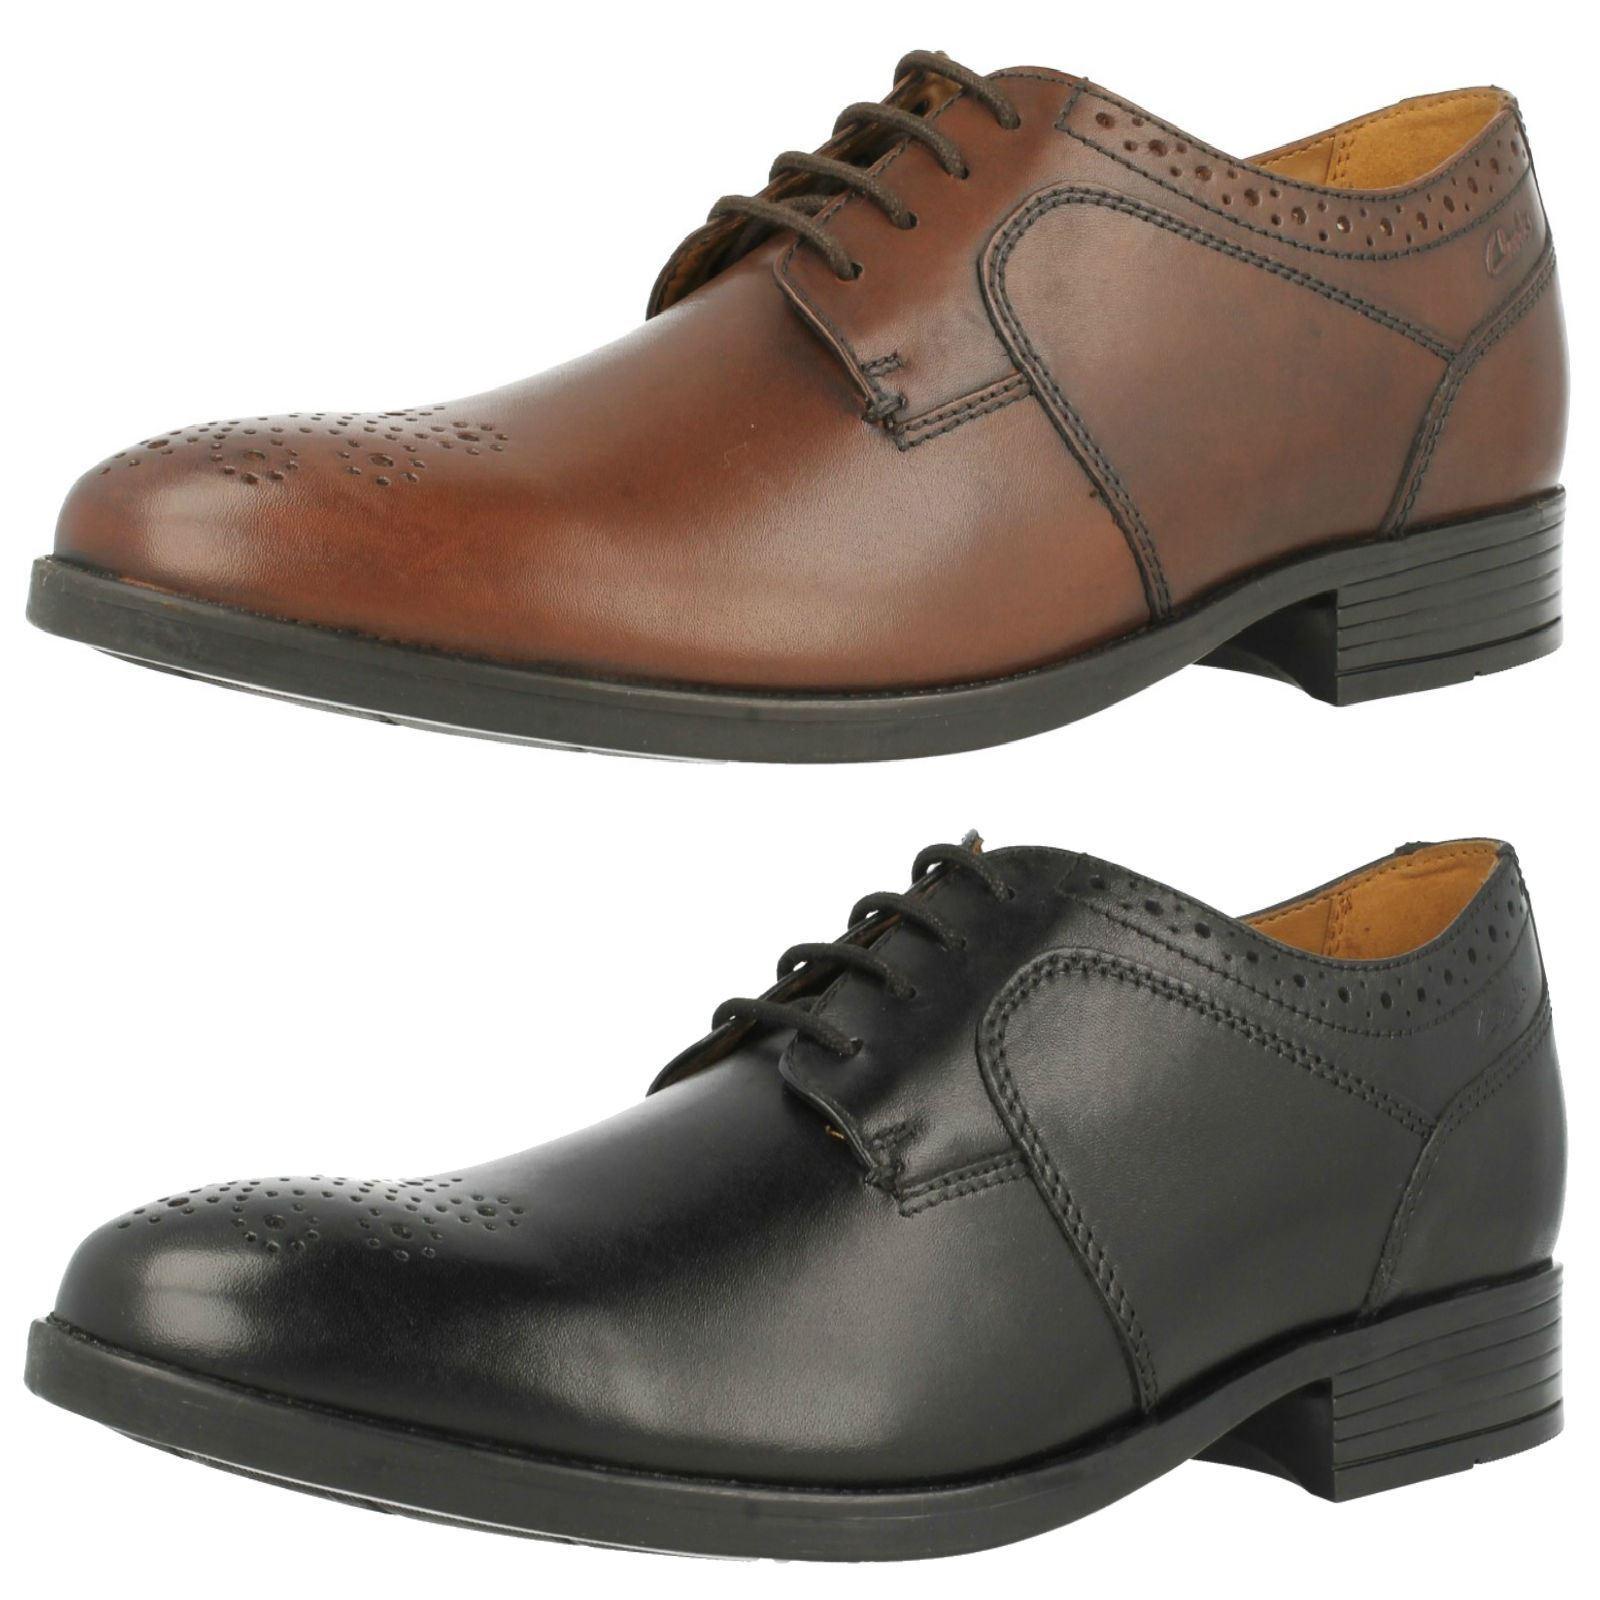 Mens Clarks Semi Brogue Formal Shoes Kalden Edge